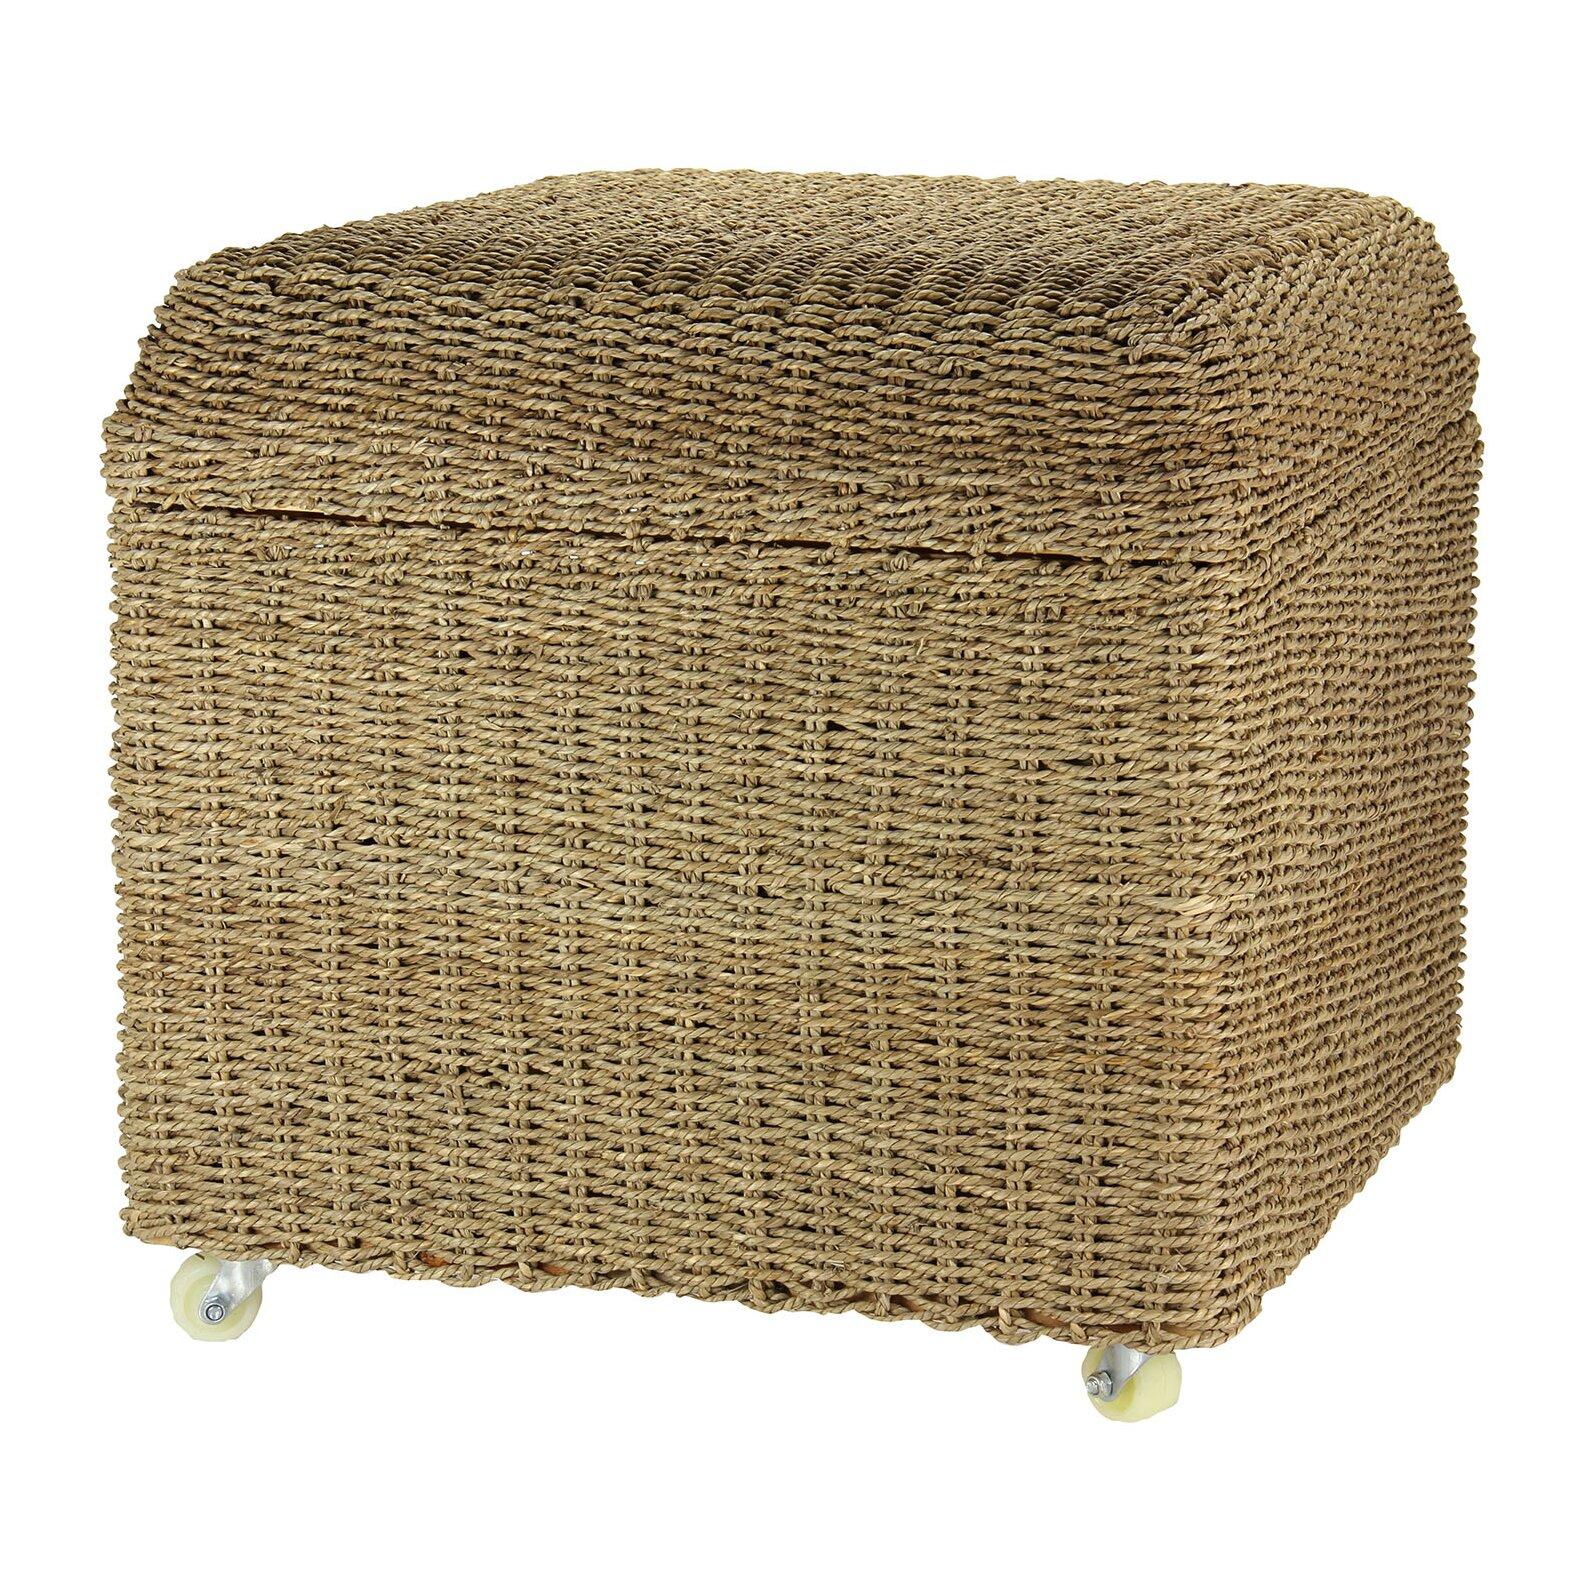 Household Essentials Rolling Seagrass Wicker Storage Seat